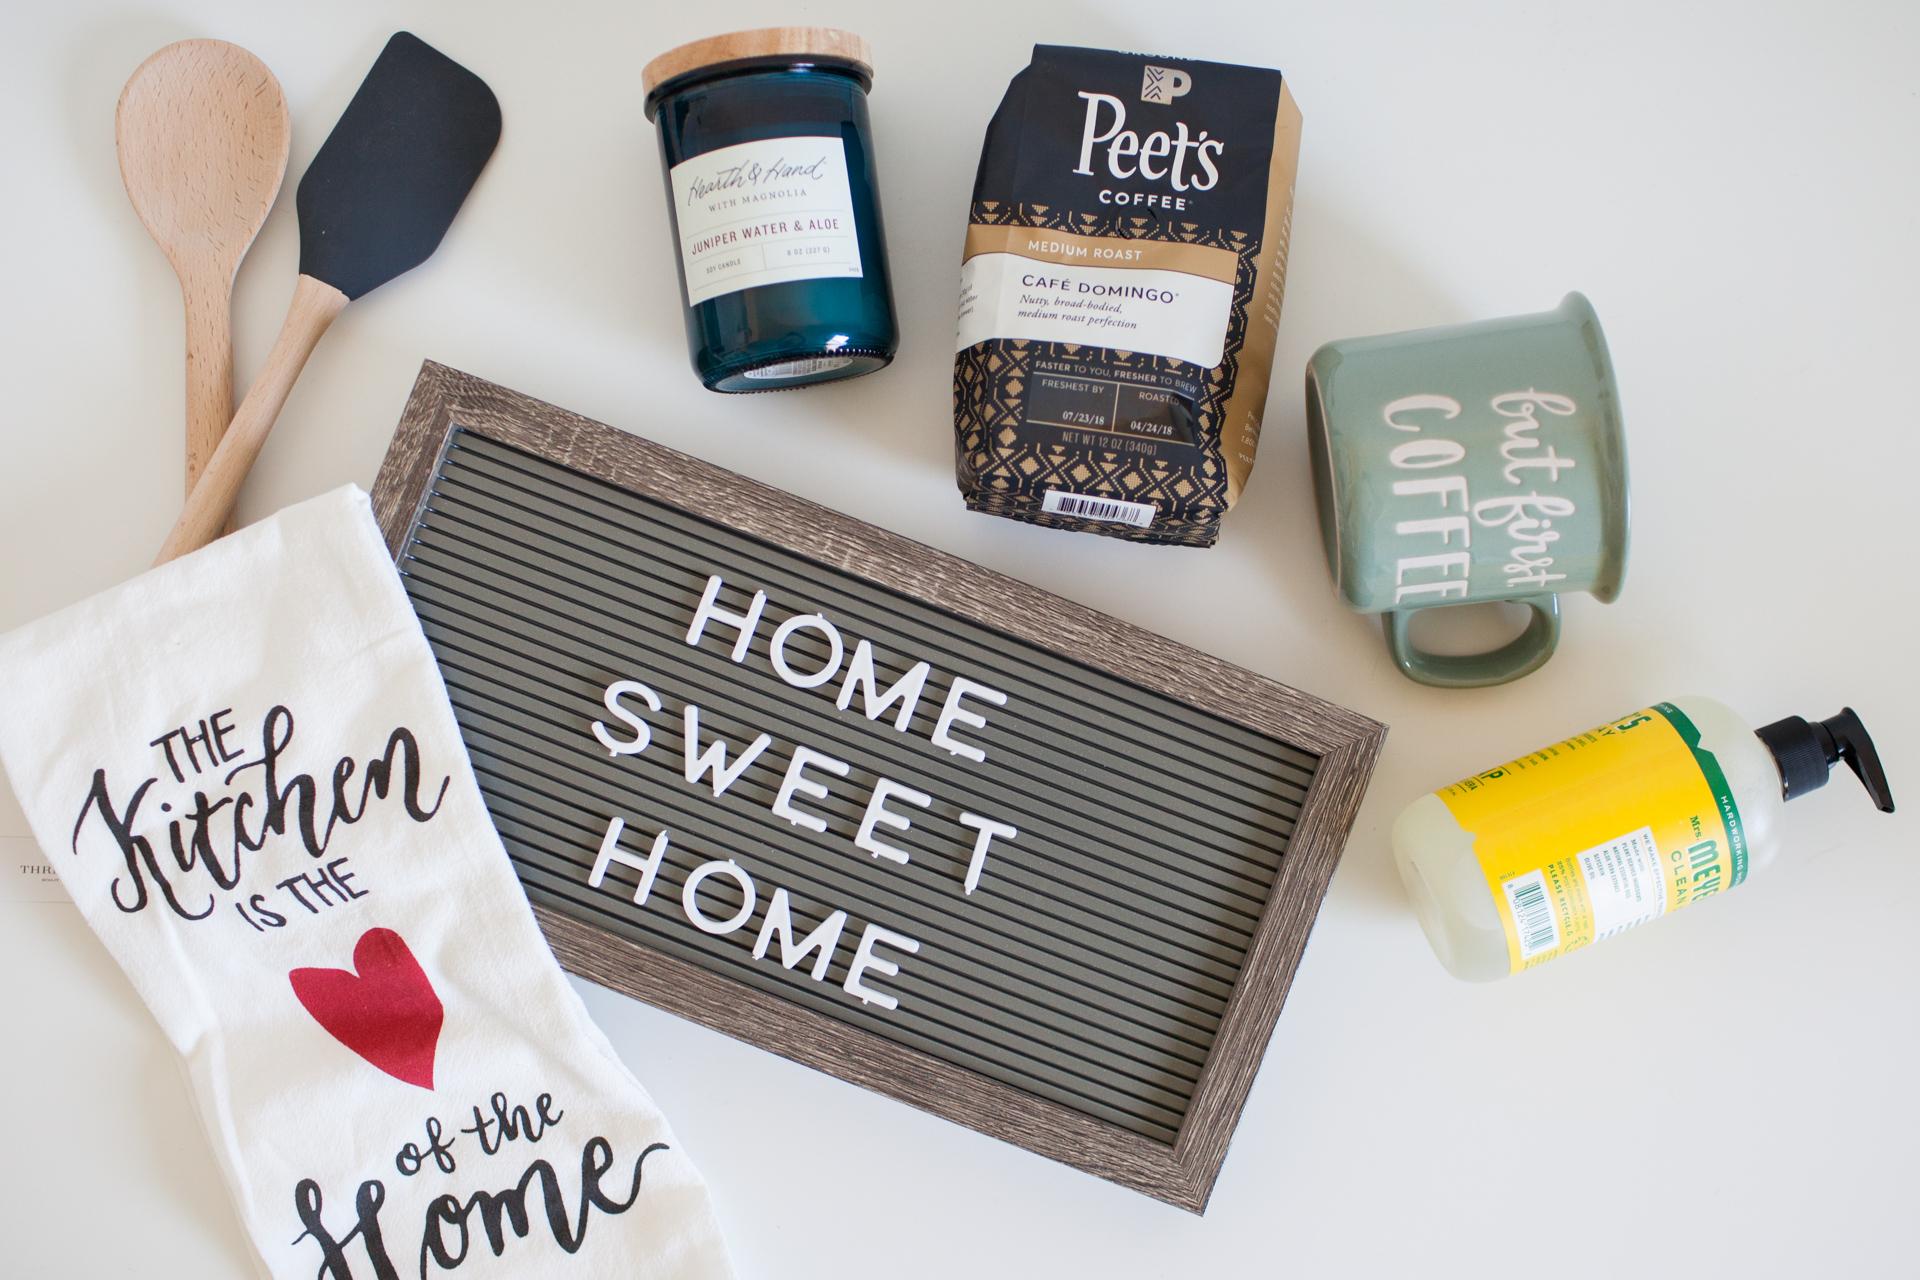 Moving Essentials - Housewarming Gift